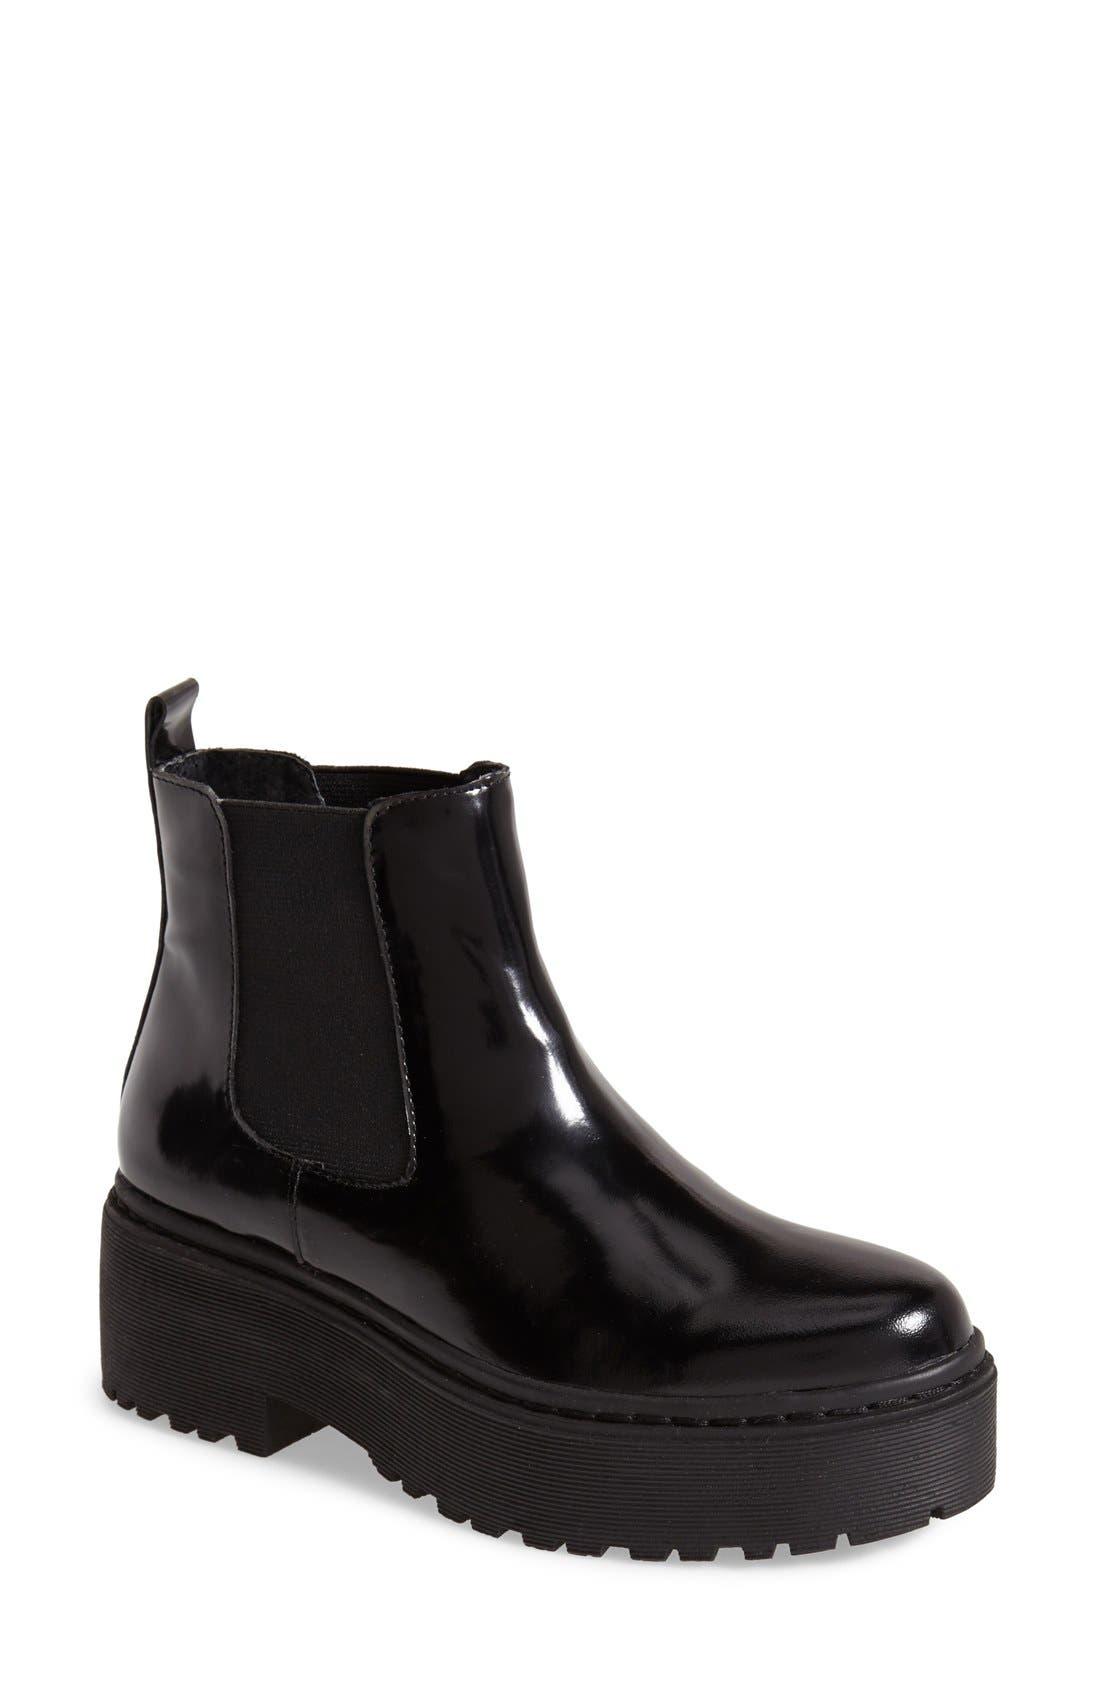 Alternate Image 1 Selected - Jeffrey Campbell 'Universal' Chelsea Boot (Women)